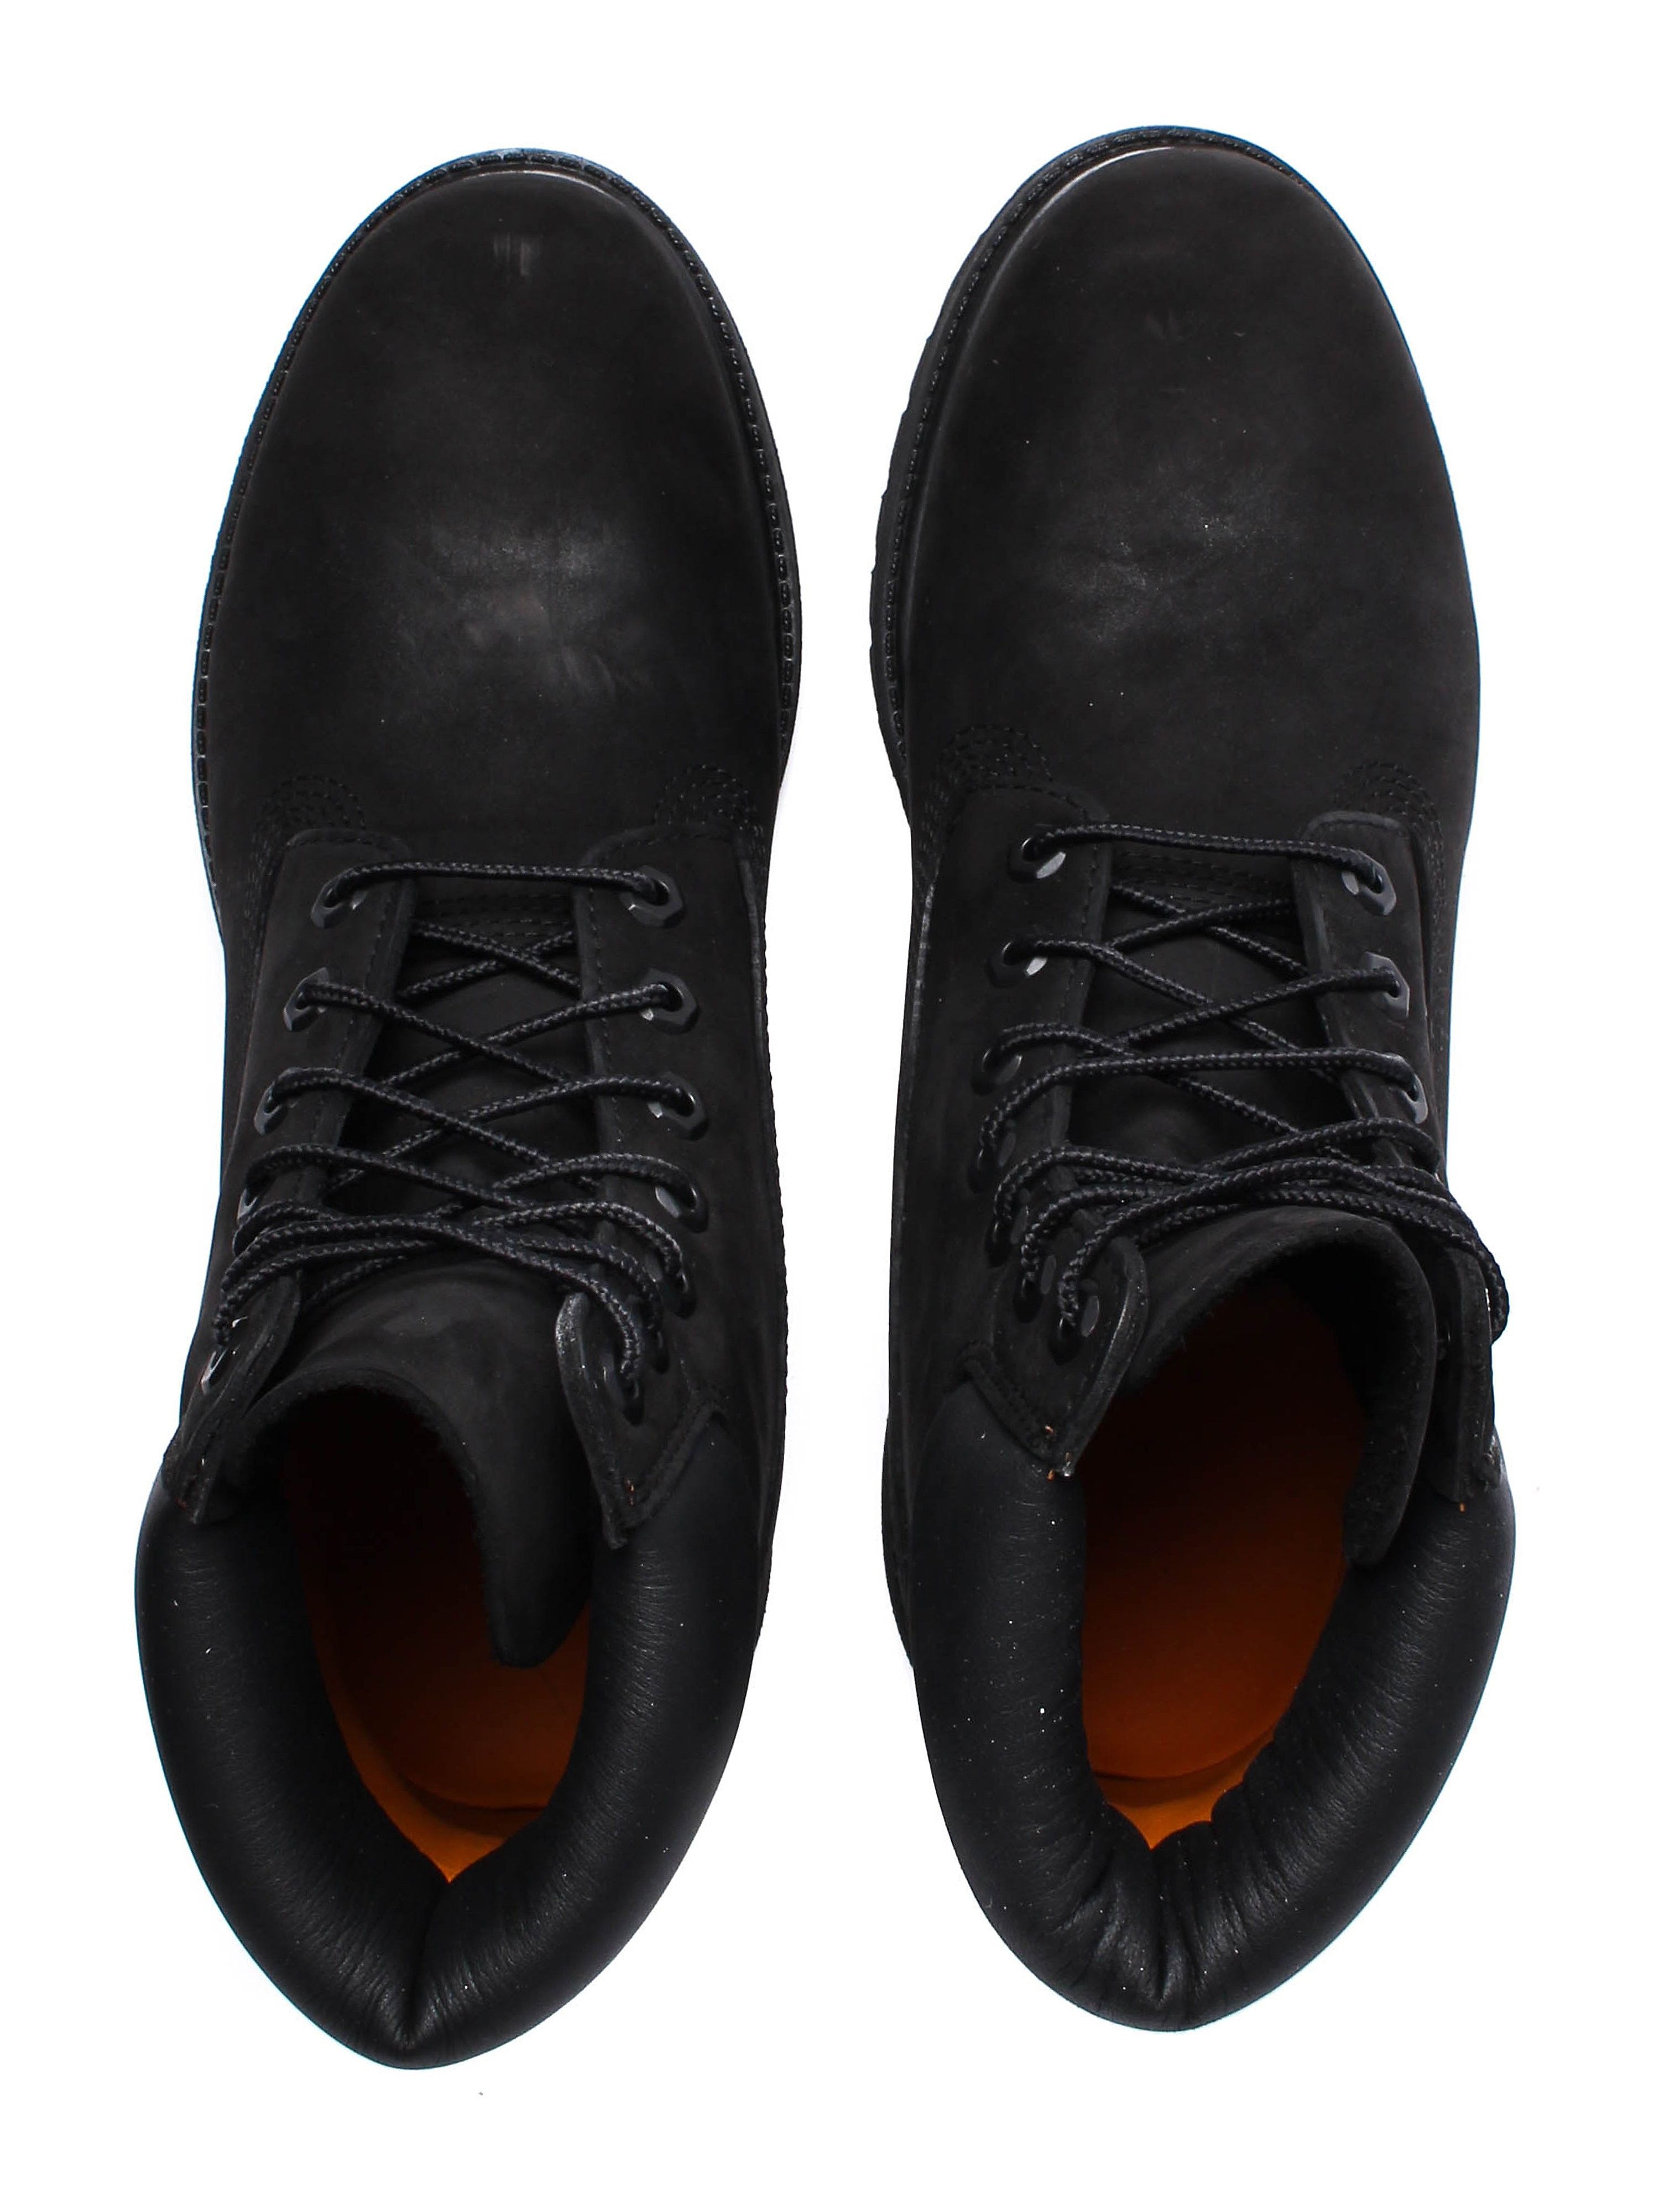 Timberland Mens 6 Inch Premium - Black Nubuck